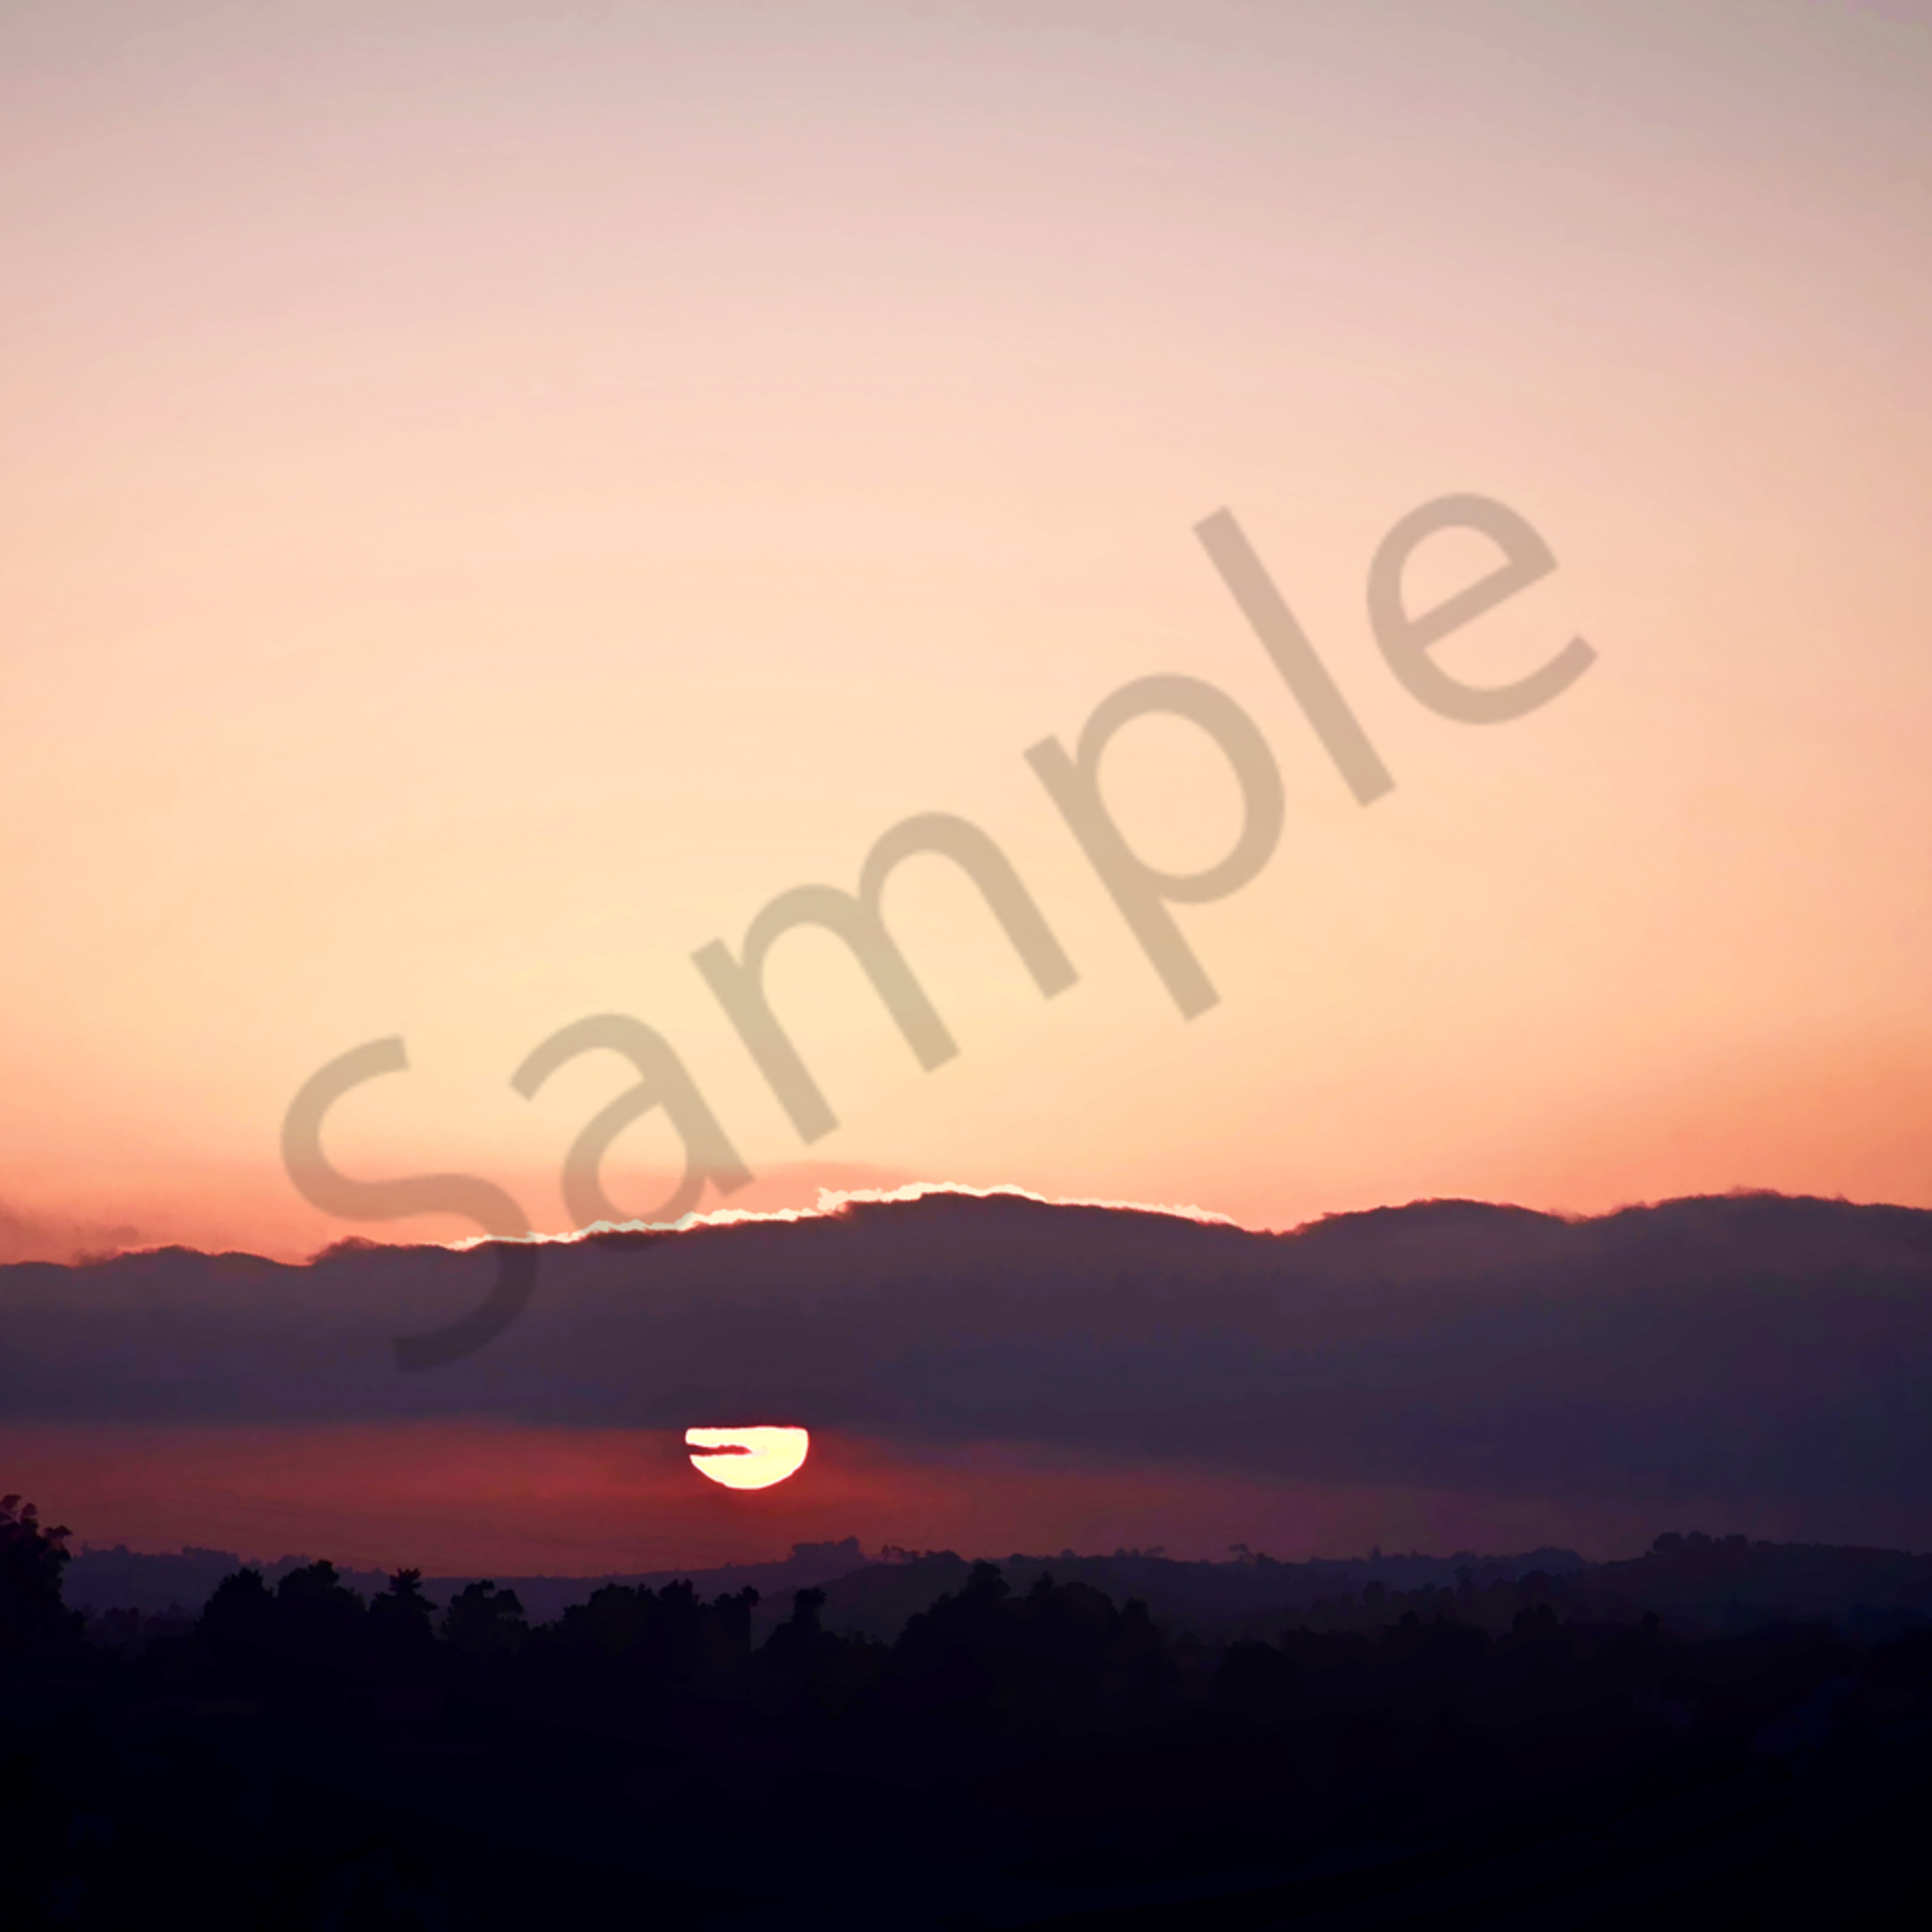 Dsc 8655 sunset watch clsc 2013   topaz painting i nr2 ec tag vykggf